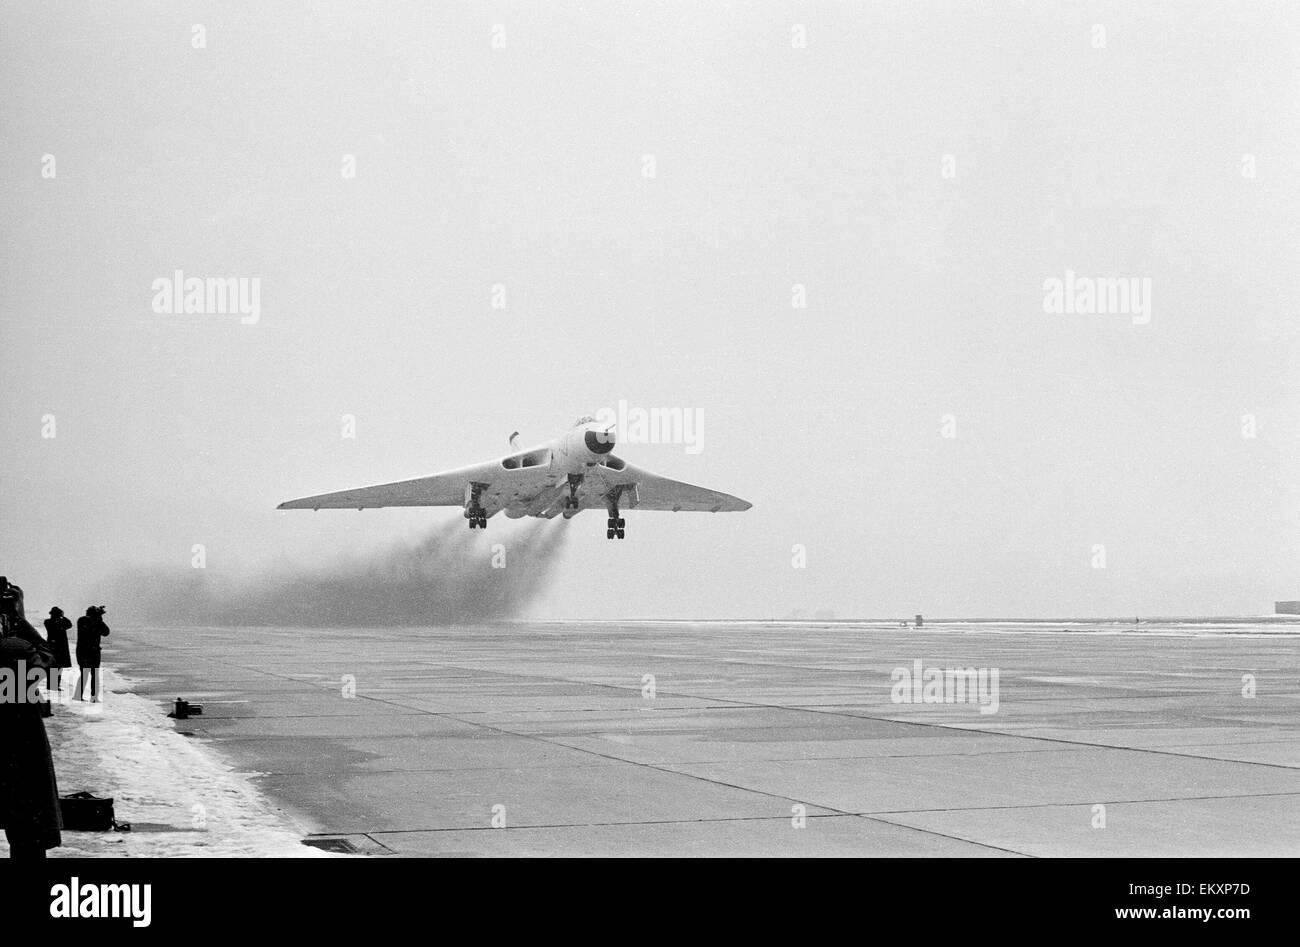 Un bombardero V despegando. 1963 Imagen De Stock